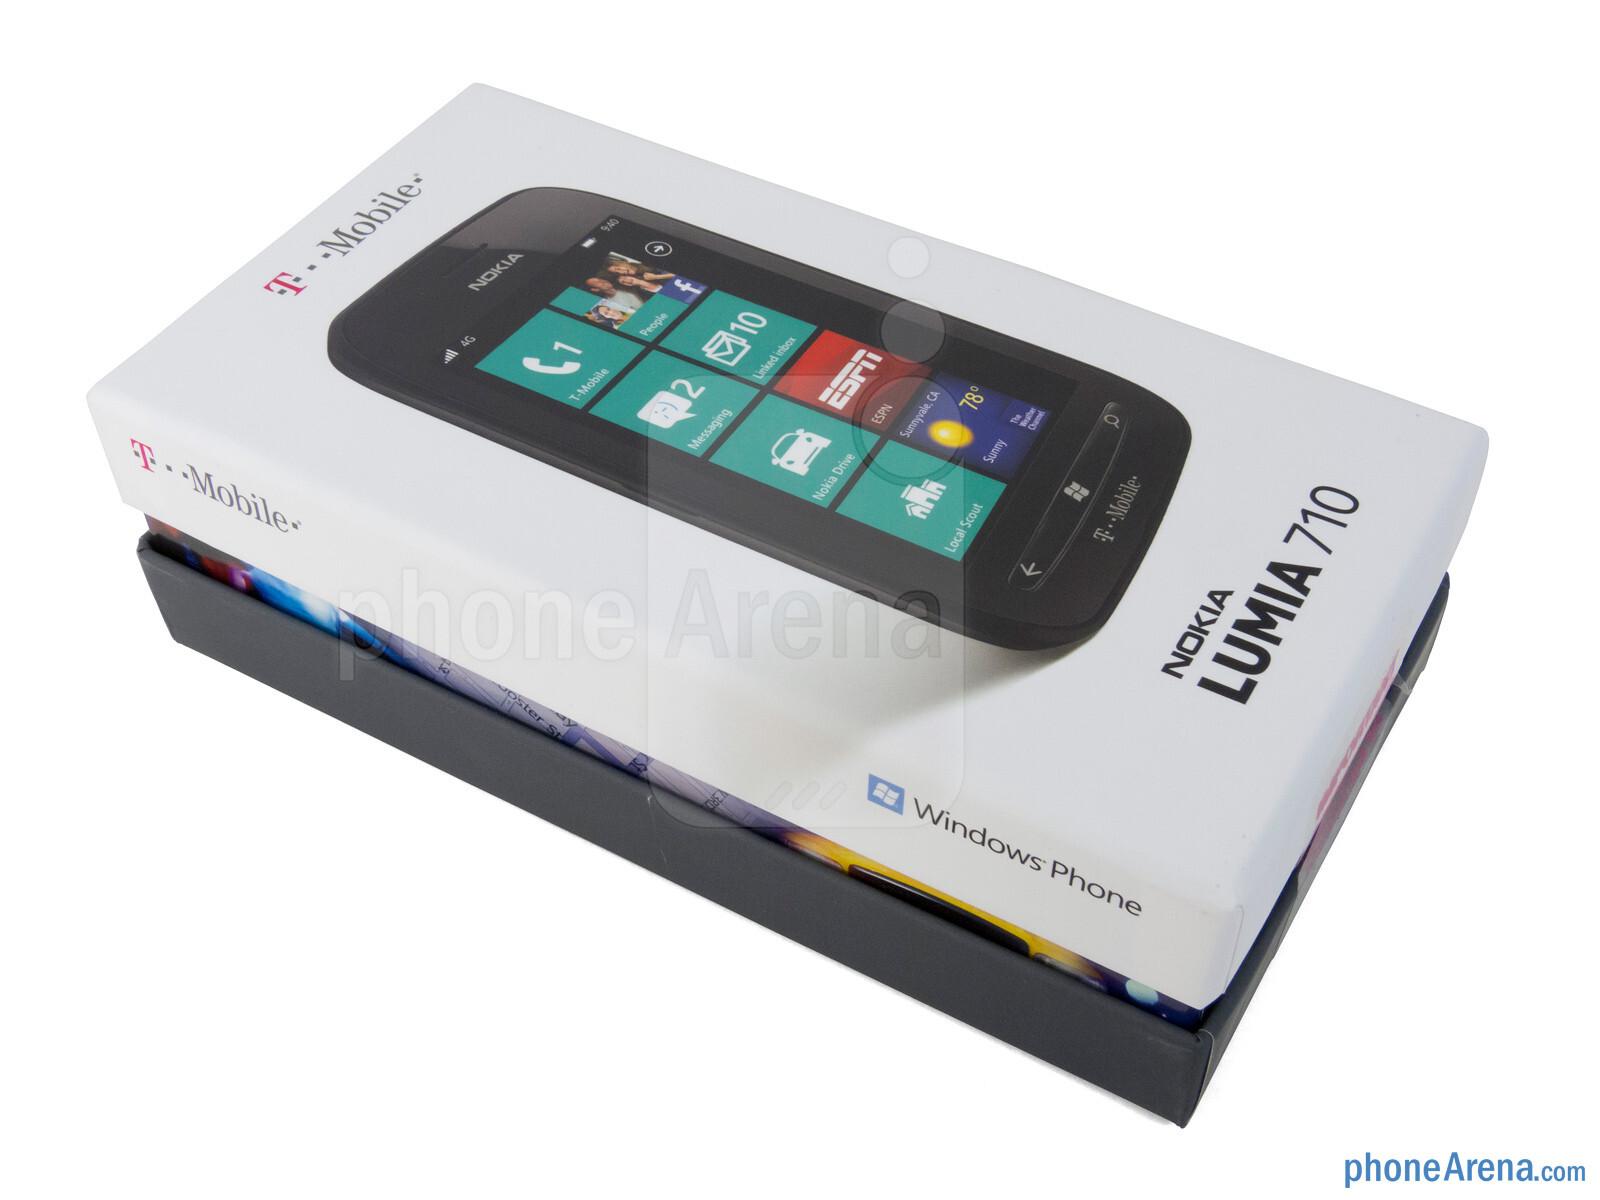 nokia lumia 710 review phonearena. Black Bedroom Furniture Sets. Home Design Ideas